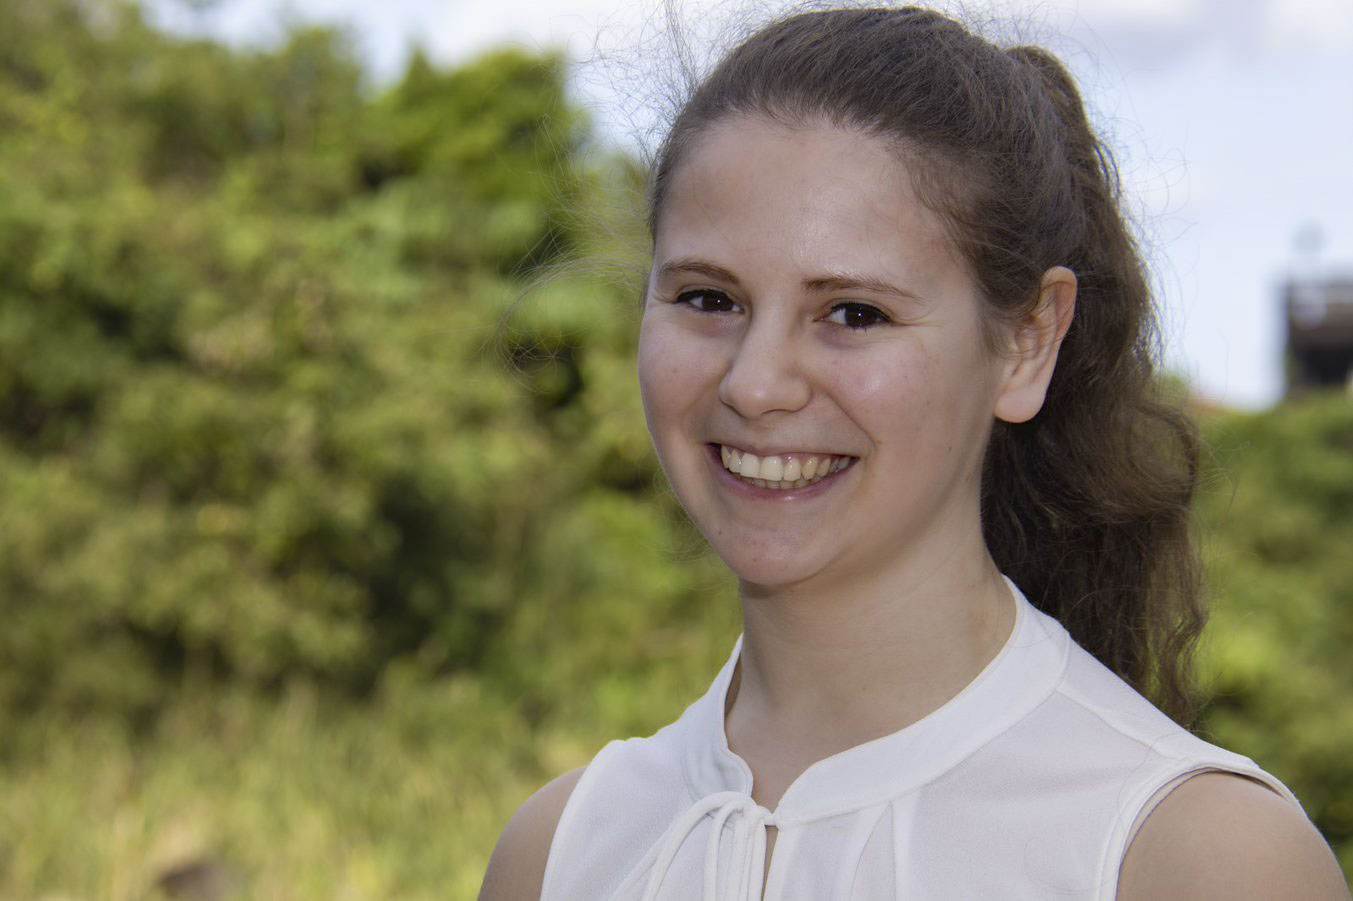 Photo of Dani Ellenby